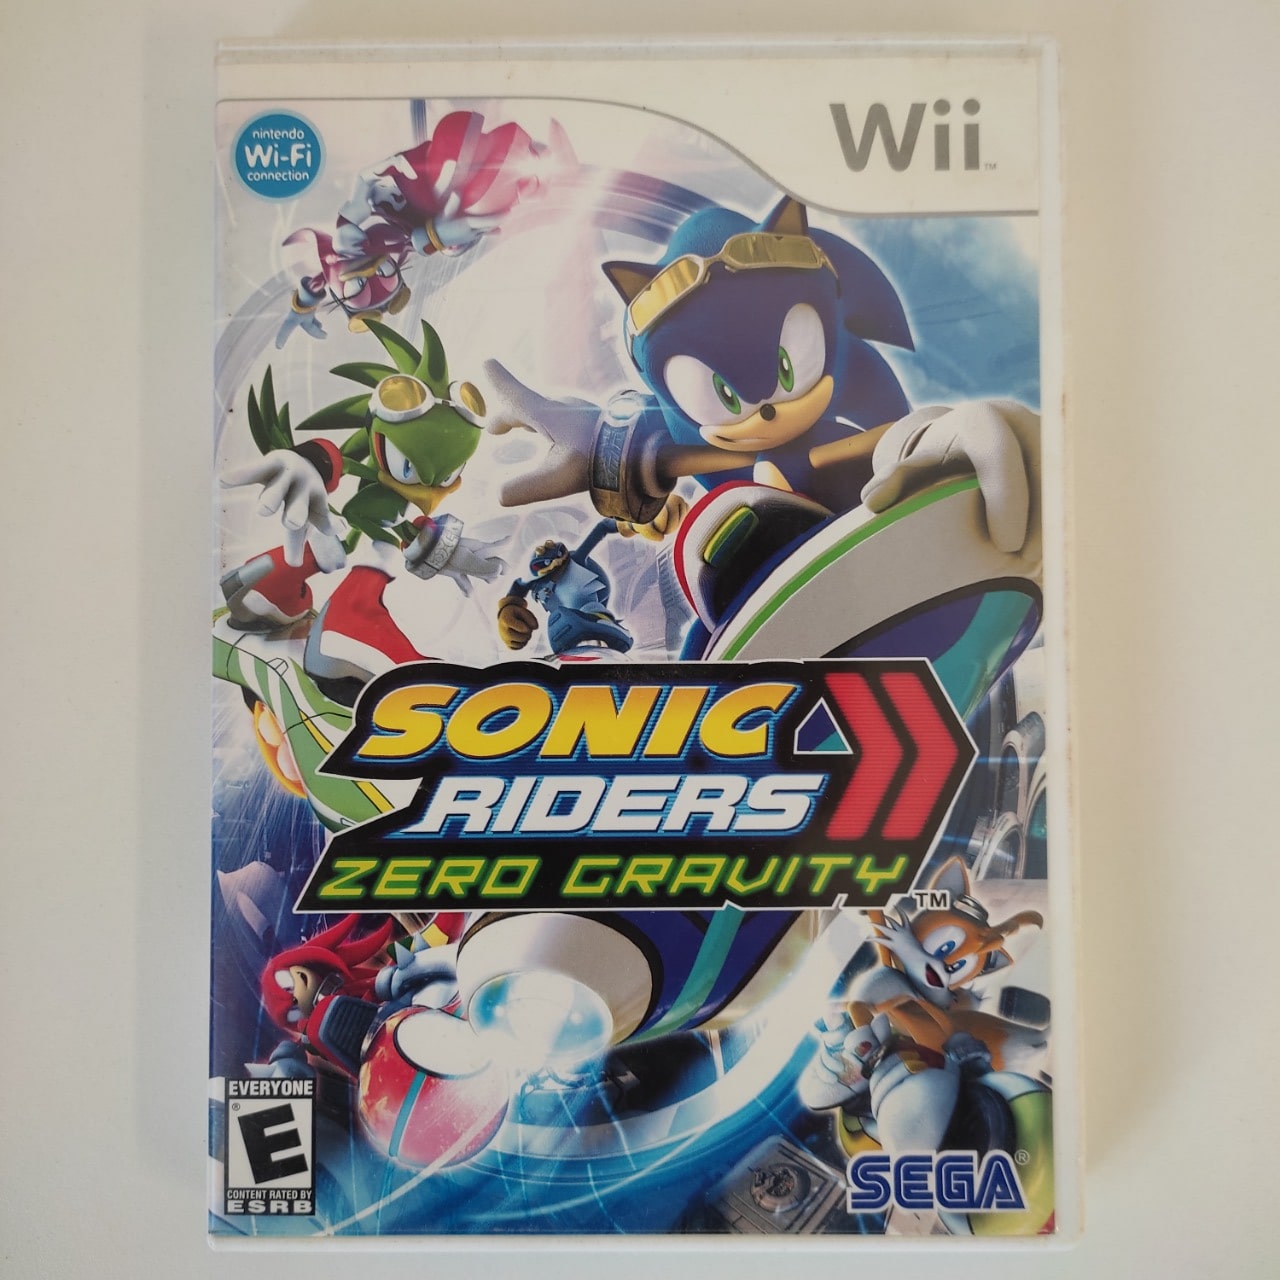 Sonic Riders Zero Gravity - Nintendo Wii - Usado